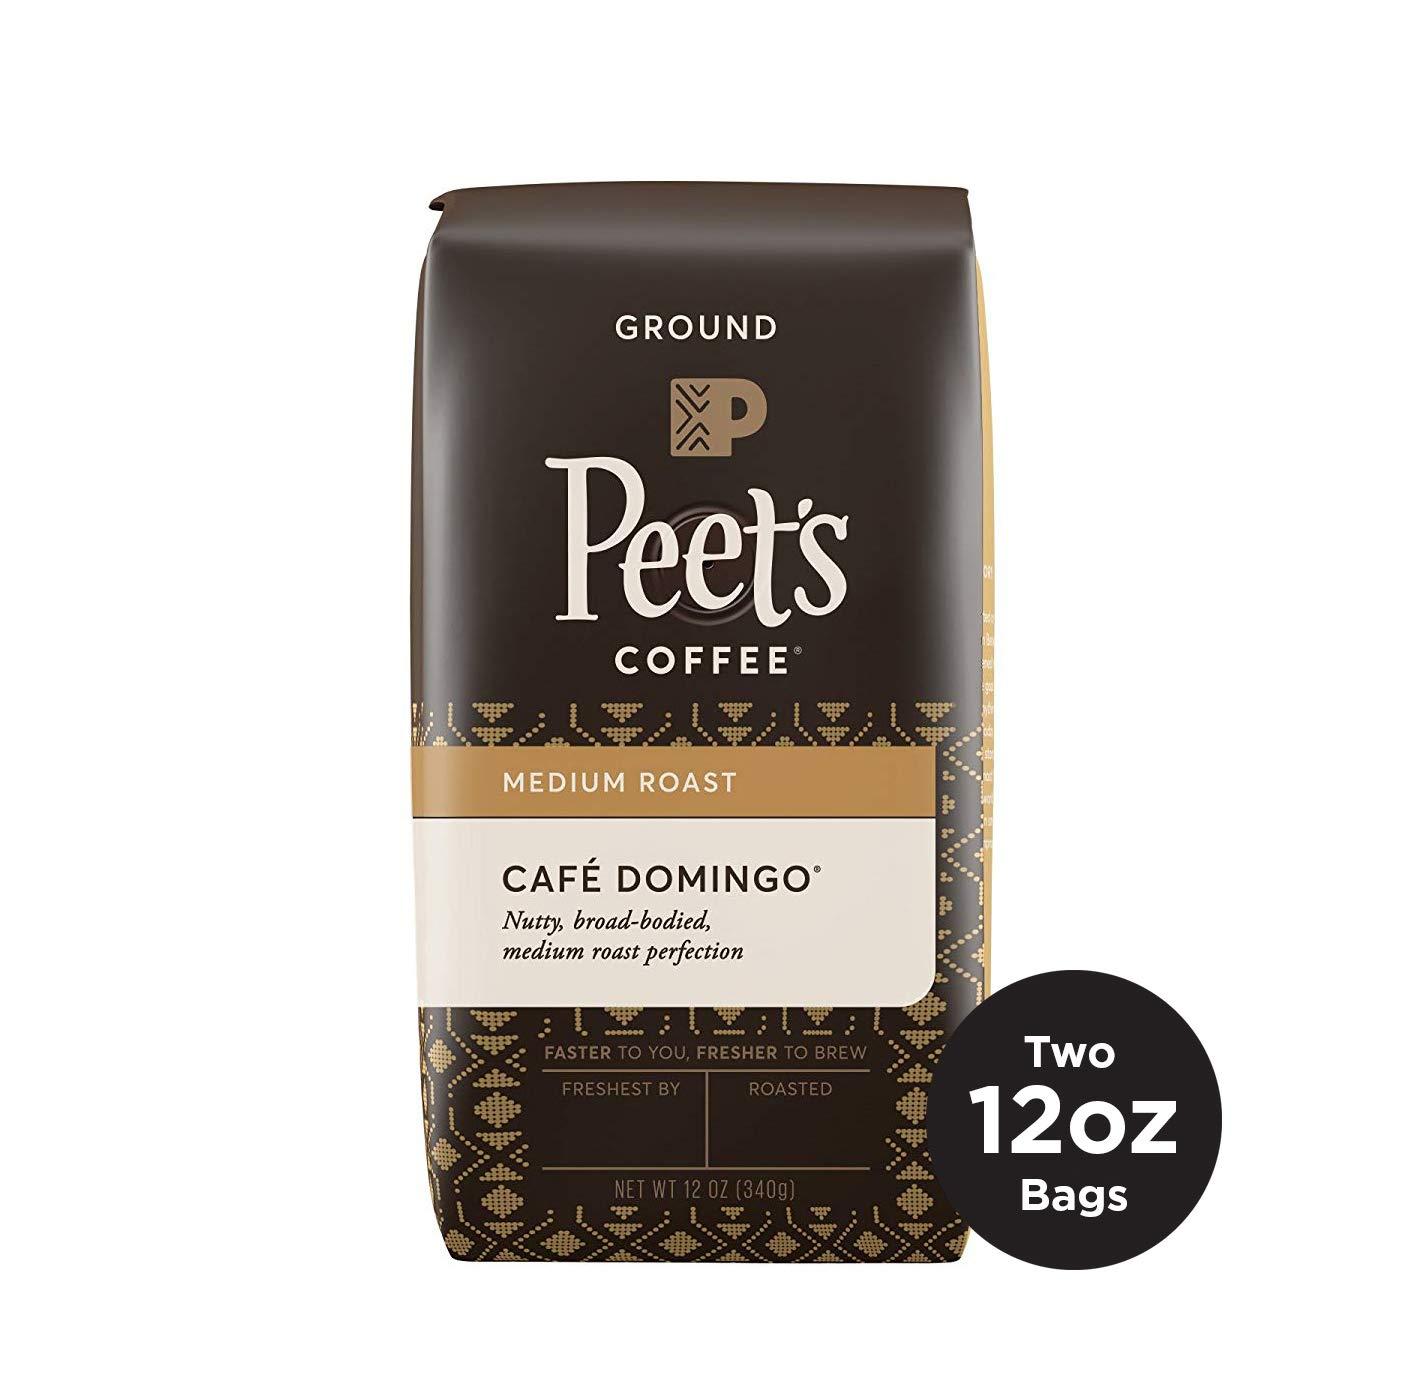 Peet's Coffee Café Domingo, Medium Roast Ground Coffee, 12 Ounce Bags (Pack of 2) Smoothly Sweet, Balanced, & Bright Medium Roast Blend of Latin American Coffees, with A Crisp, Clean Finish